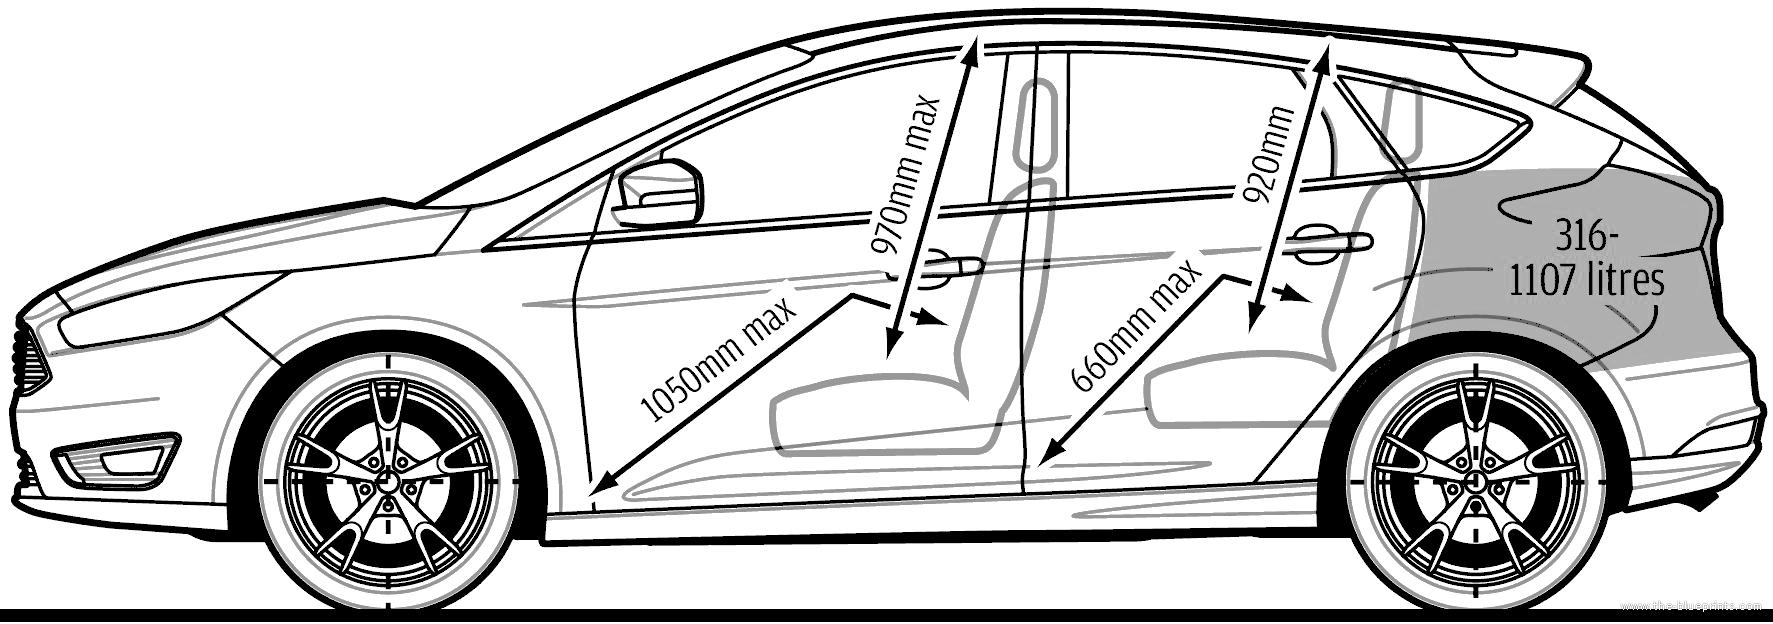 the blueprints cars ford ford focus. Black Bedroom Furniture Sets. Home Design Ideas